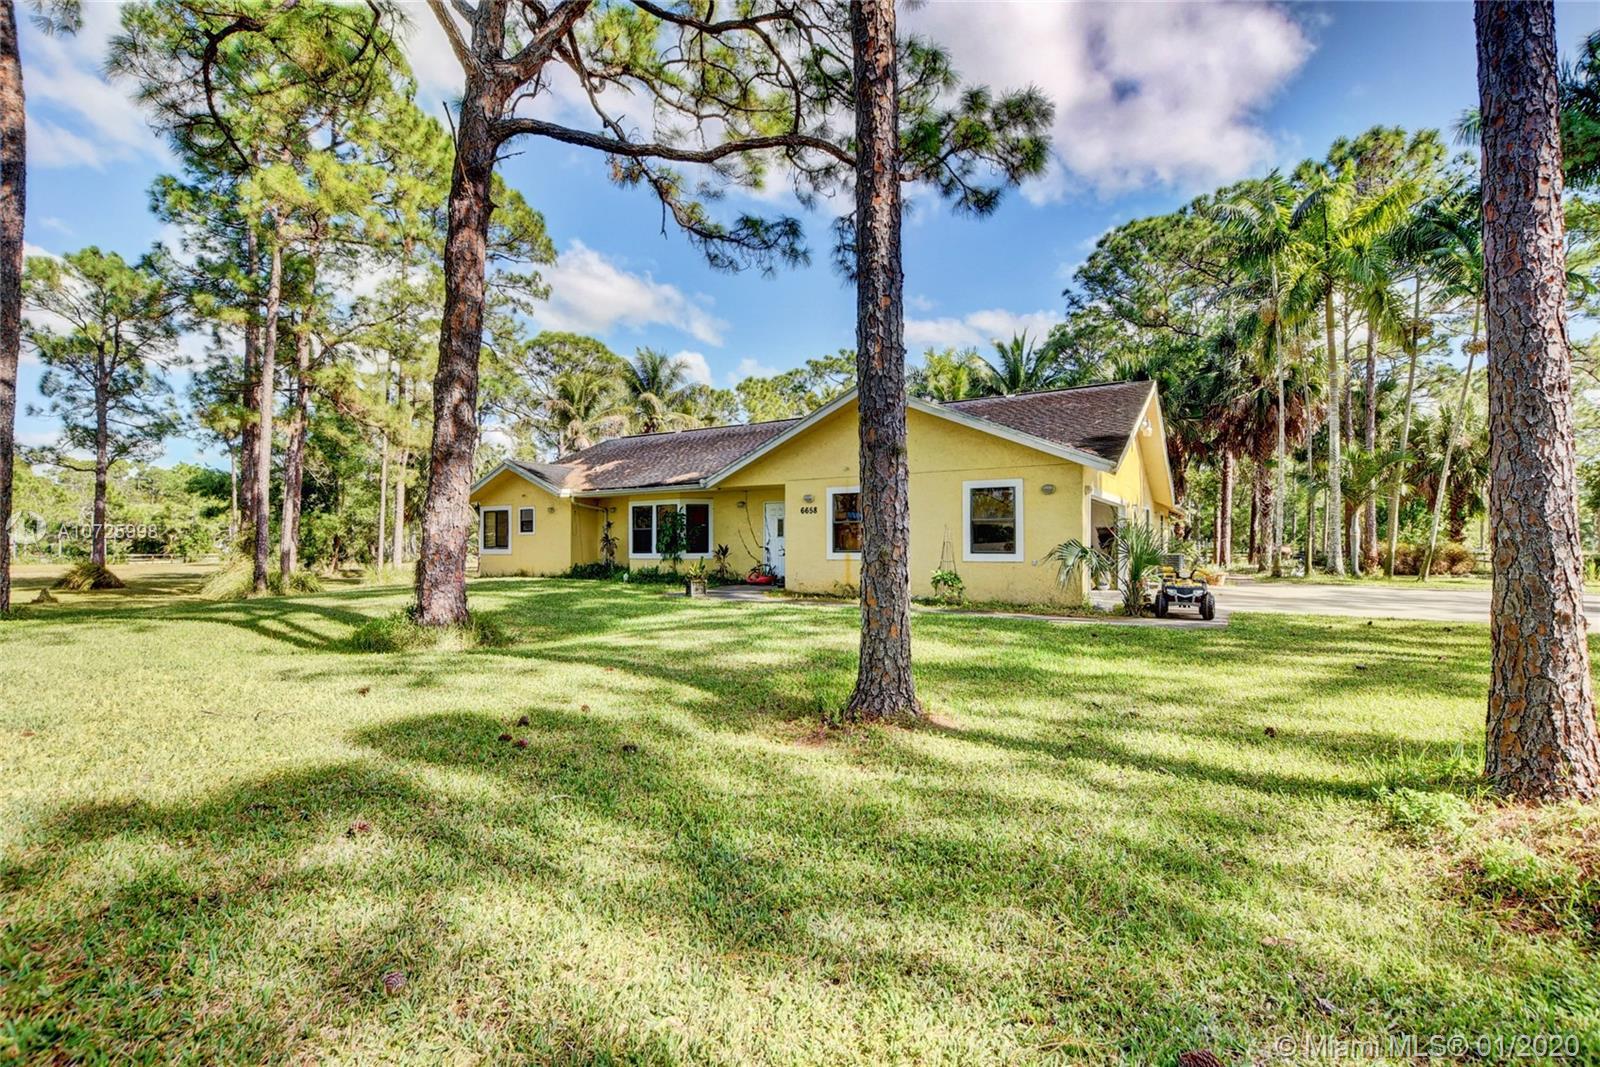 6658 N 140th Ave N Property Photo - West Palm Beach, FL real estate listing